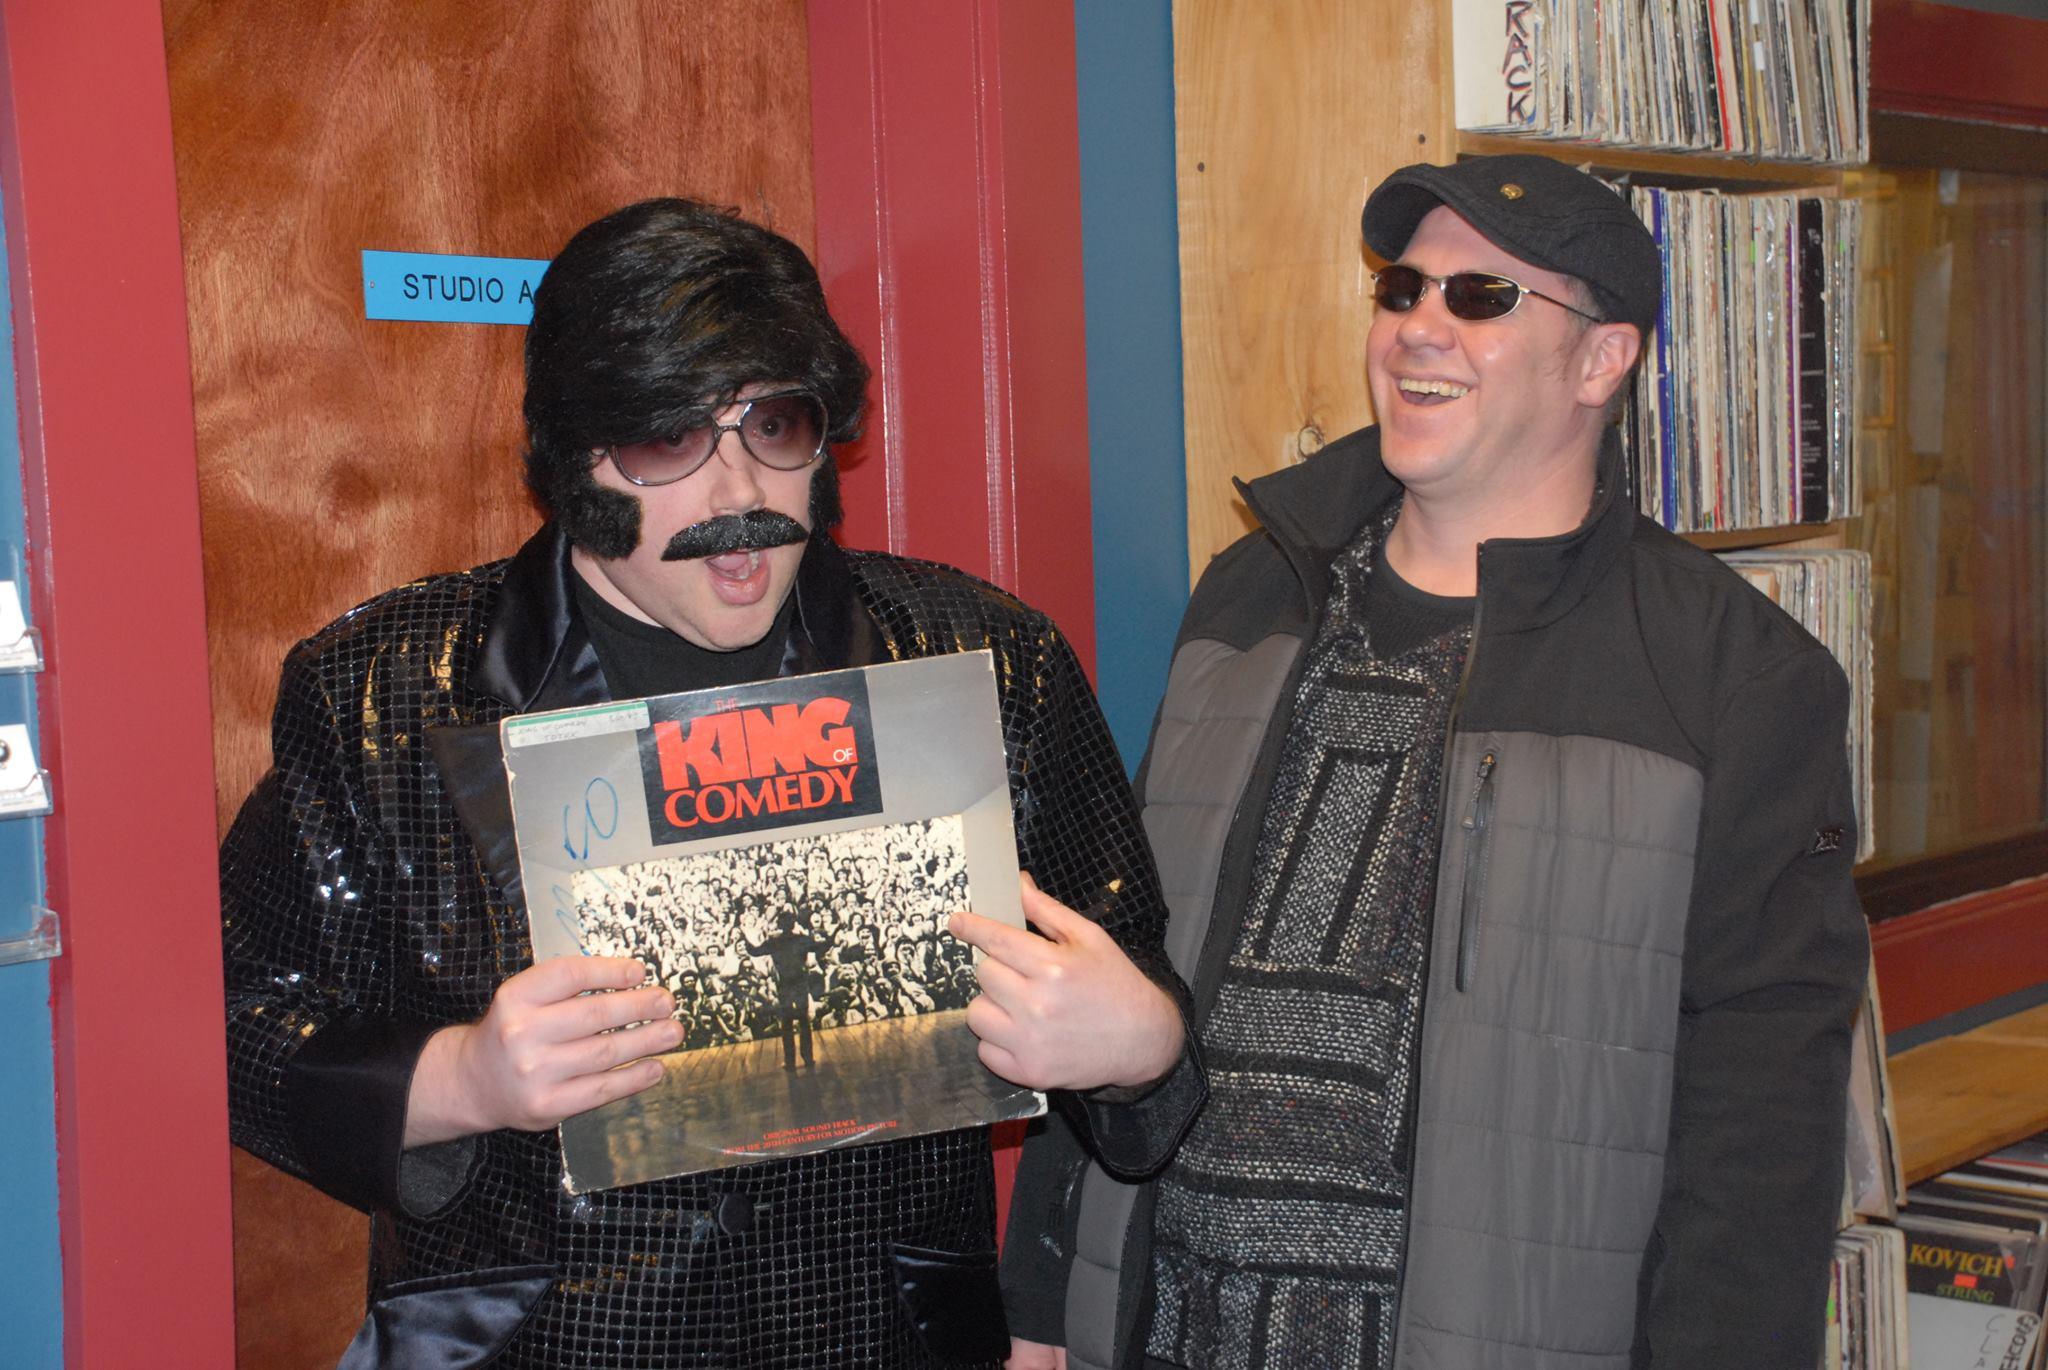 With South Boston Jeff at Tufts University Radio